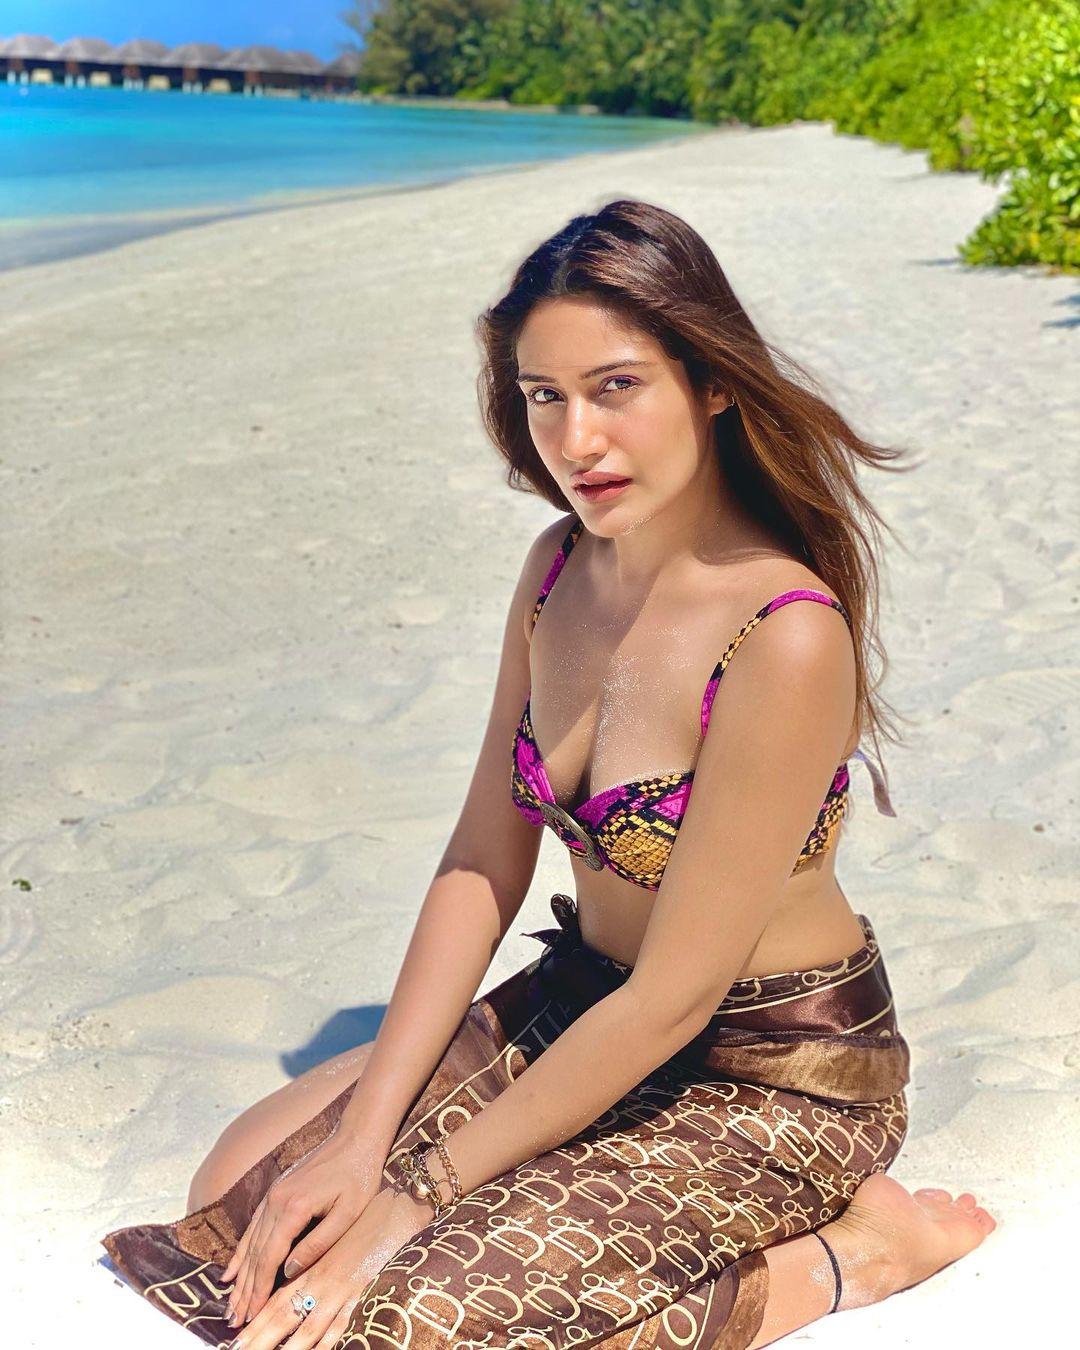 surbhi chandna,surbhi chandna hot photos,surbhi chandna viral photos,surbhi chandna photos,tv actress surbhi chandna